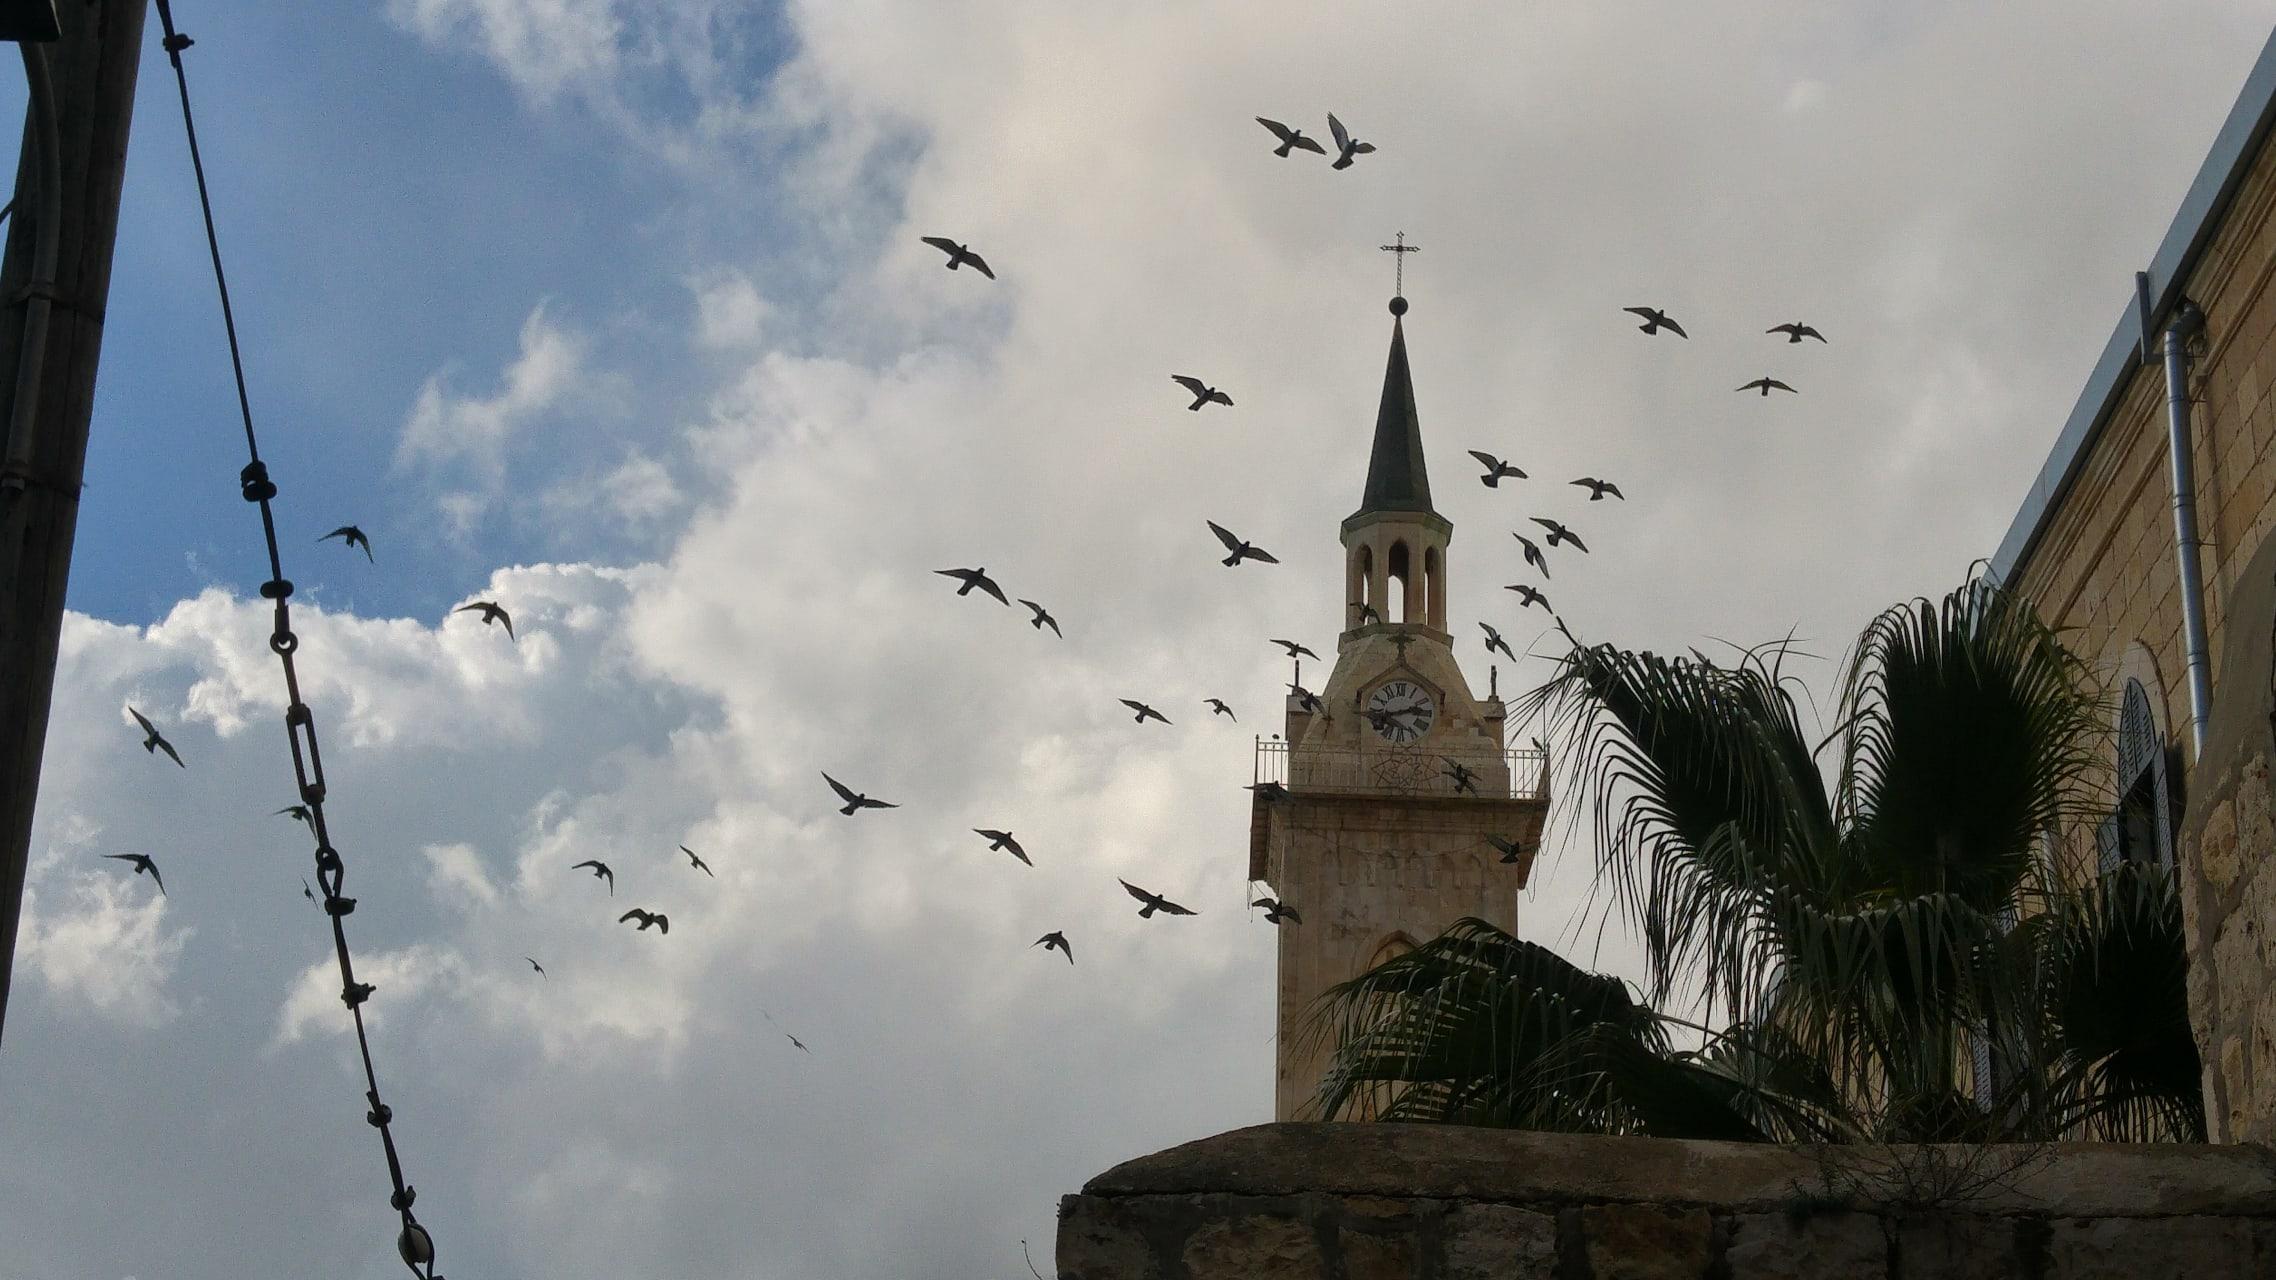 Jerusalem - Ein Karem - The Village of John the Baptist and the Home of Brave Women